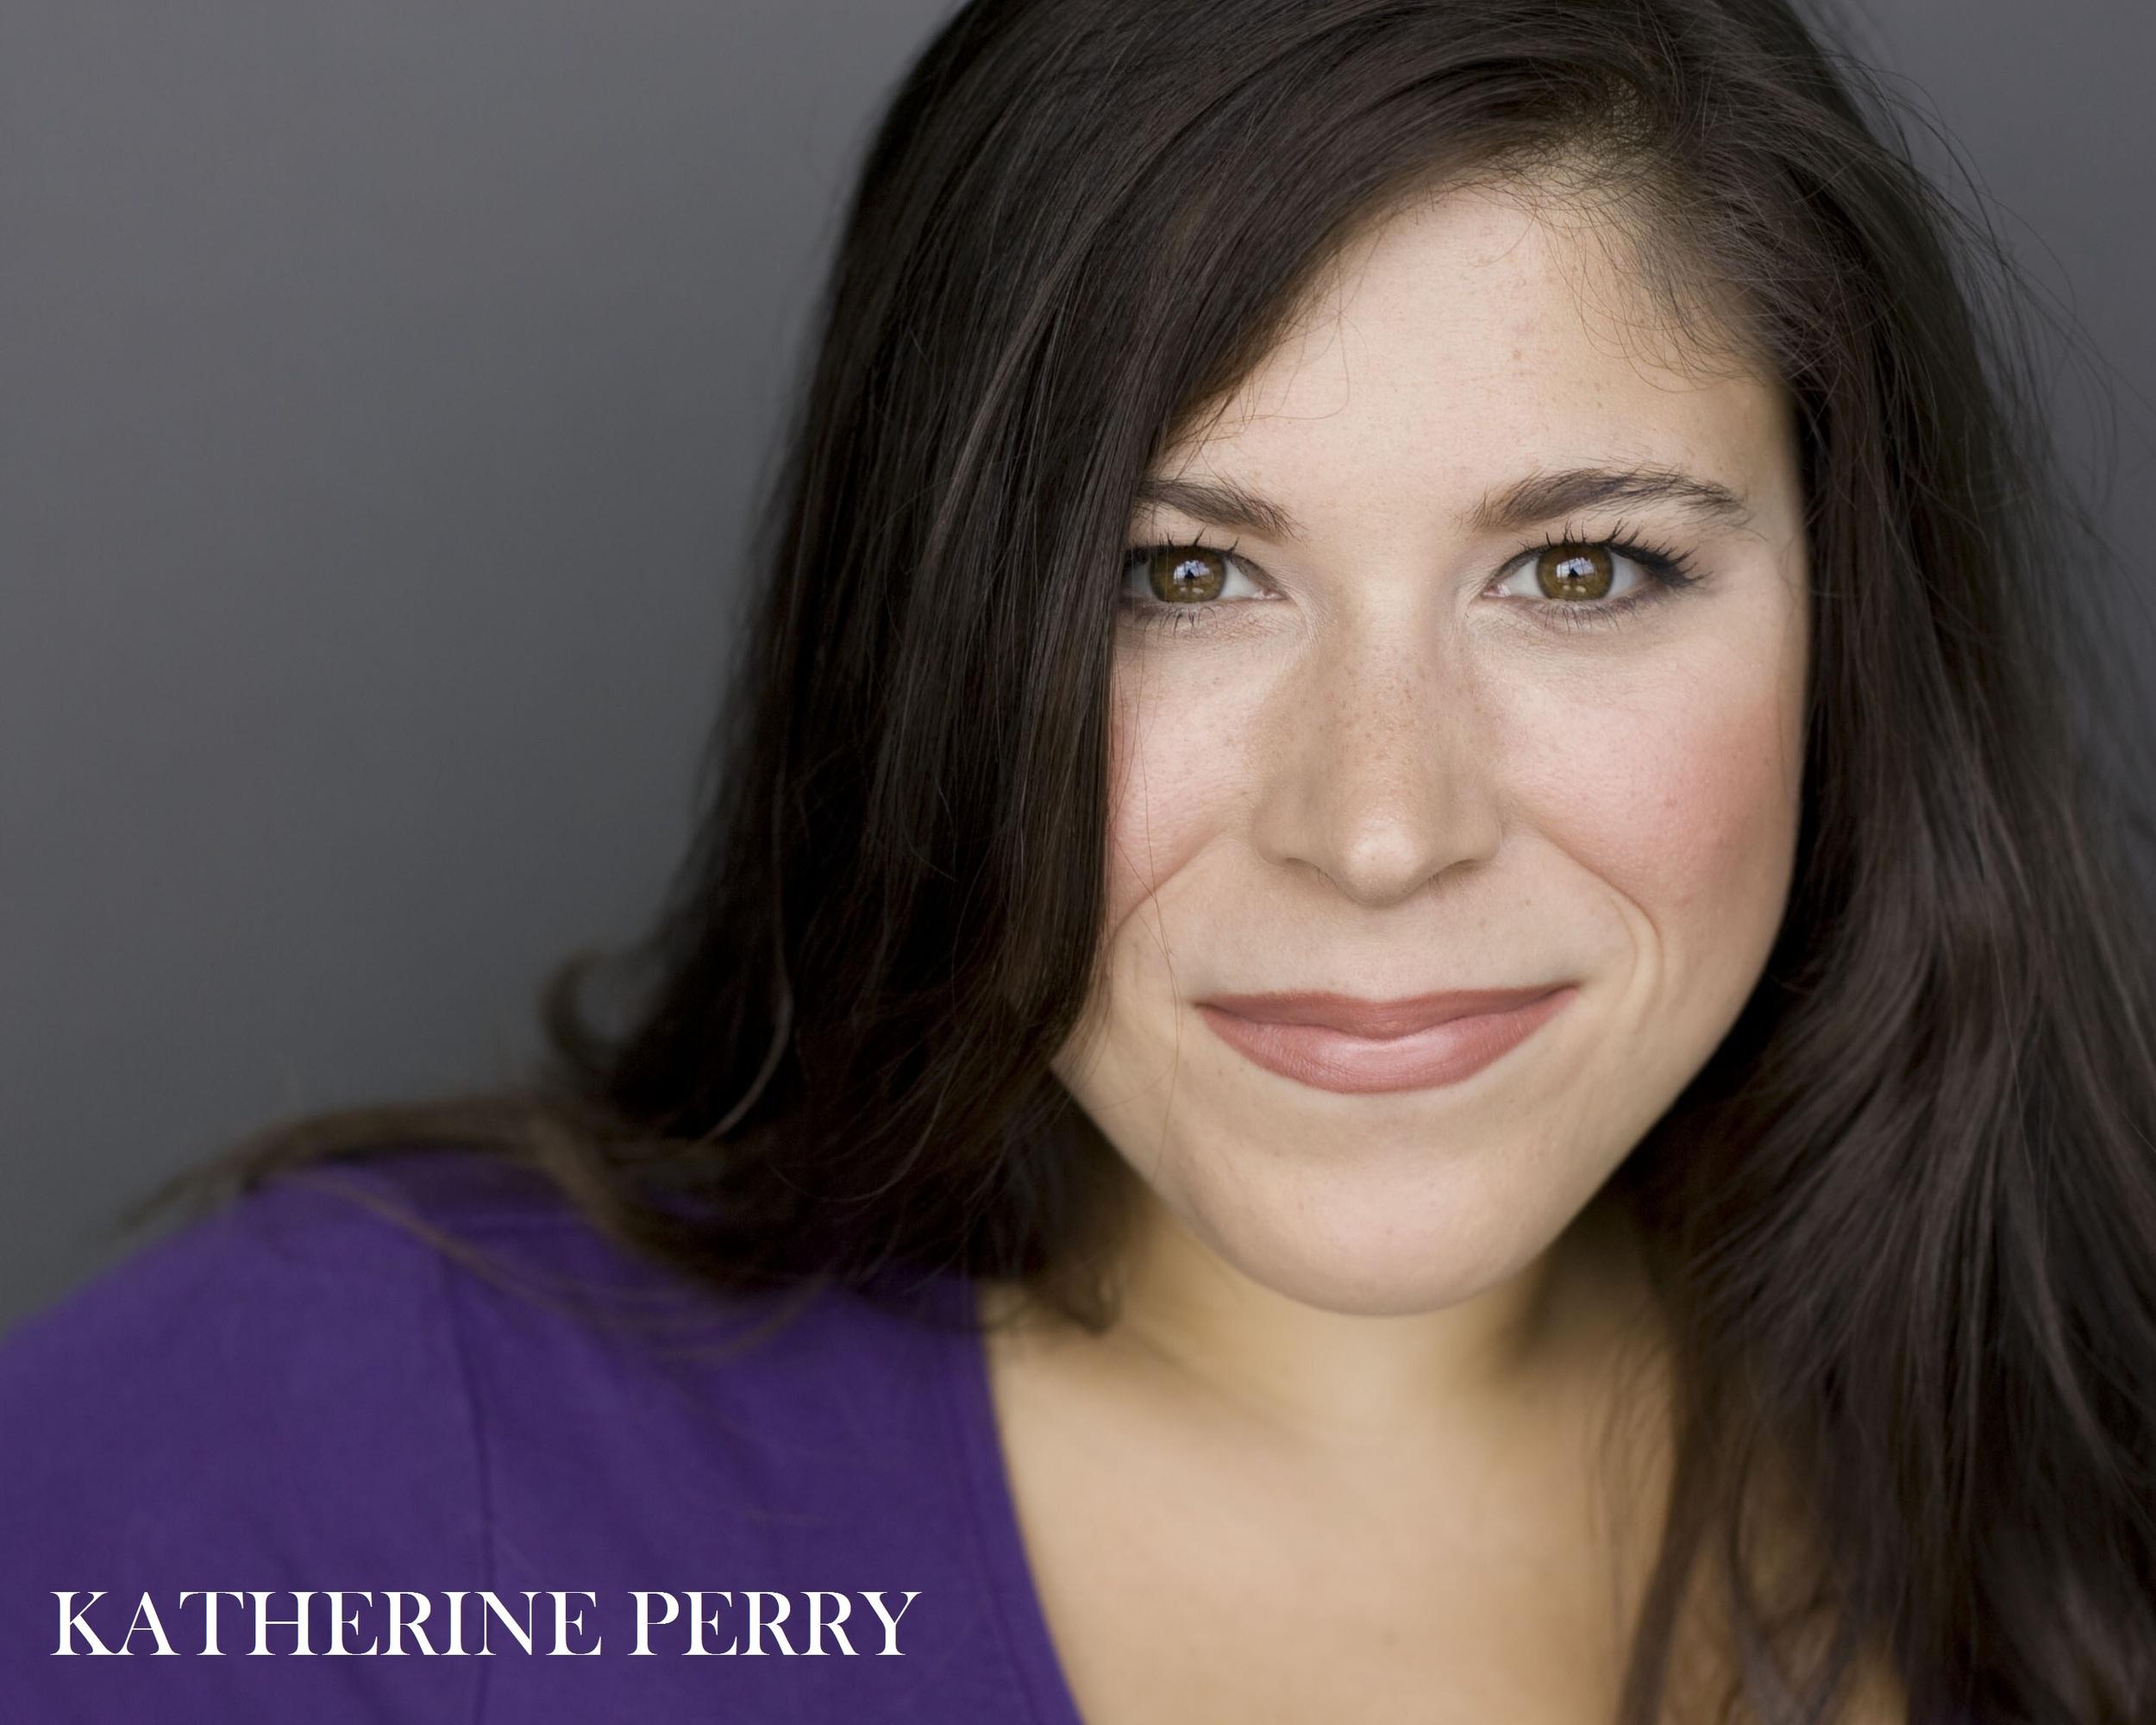 Katherine Perry, actor; Susan Rochenberger-Halberstam